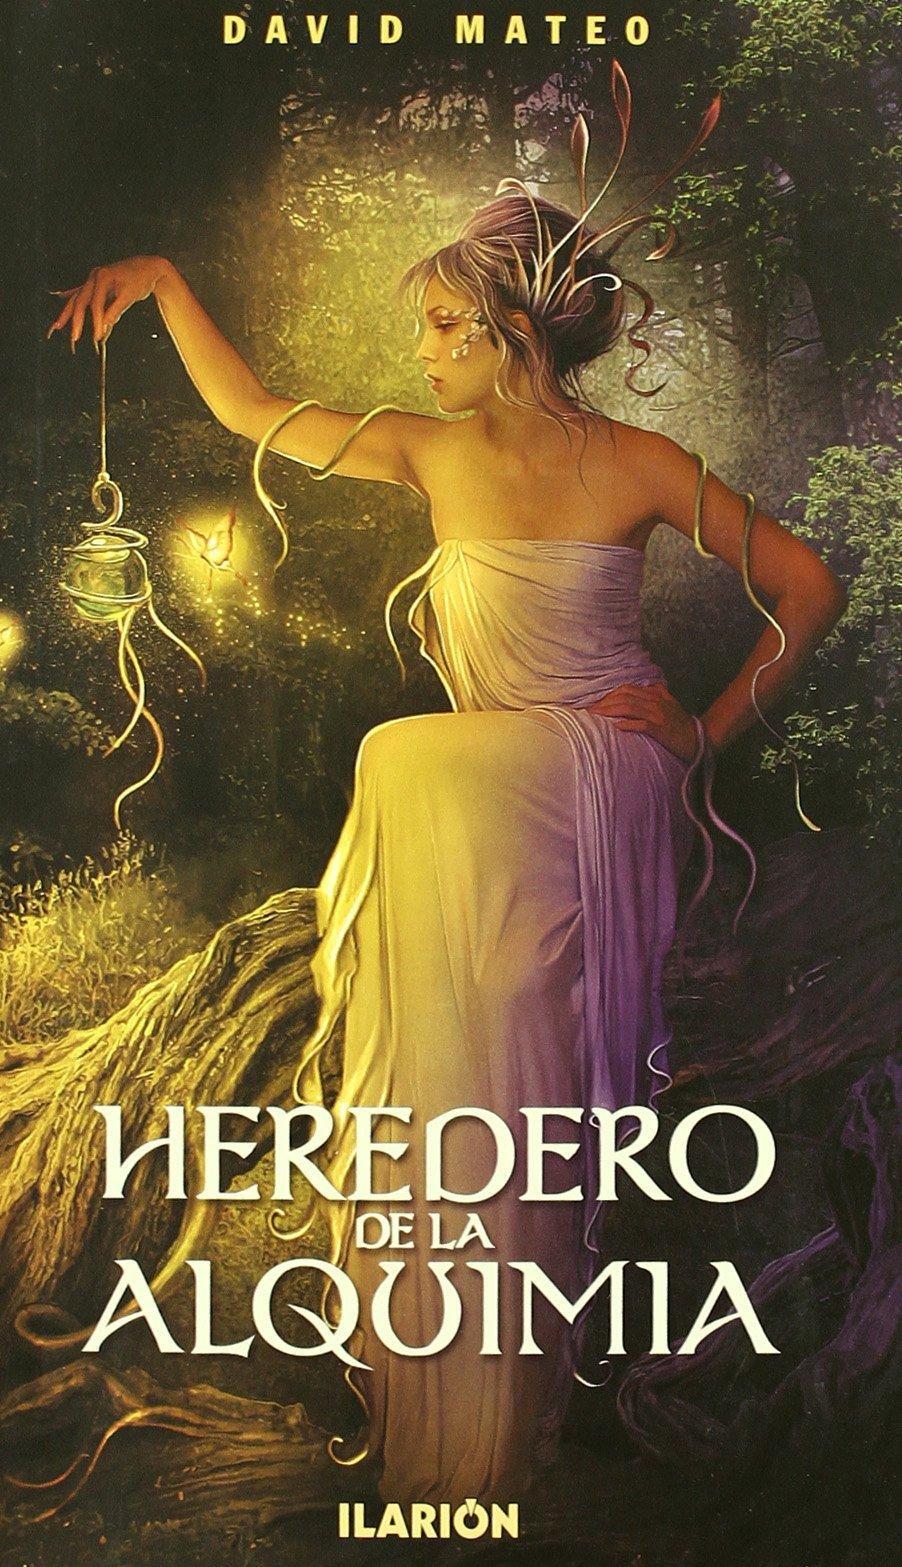 Heredero De La Alquimia (Fantasia (ilarion)): Amazon.es: David Mateo: Libros